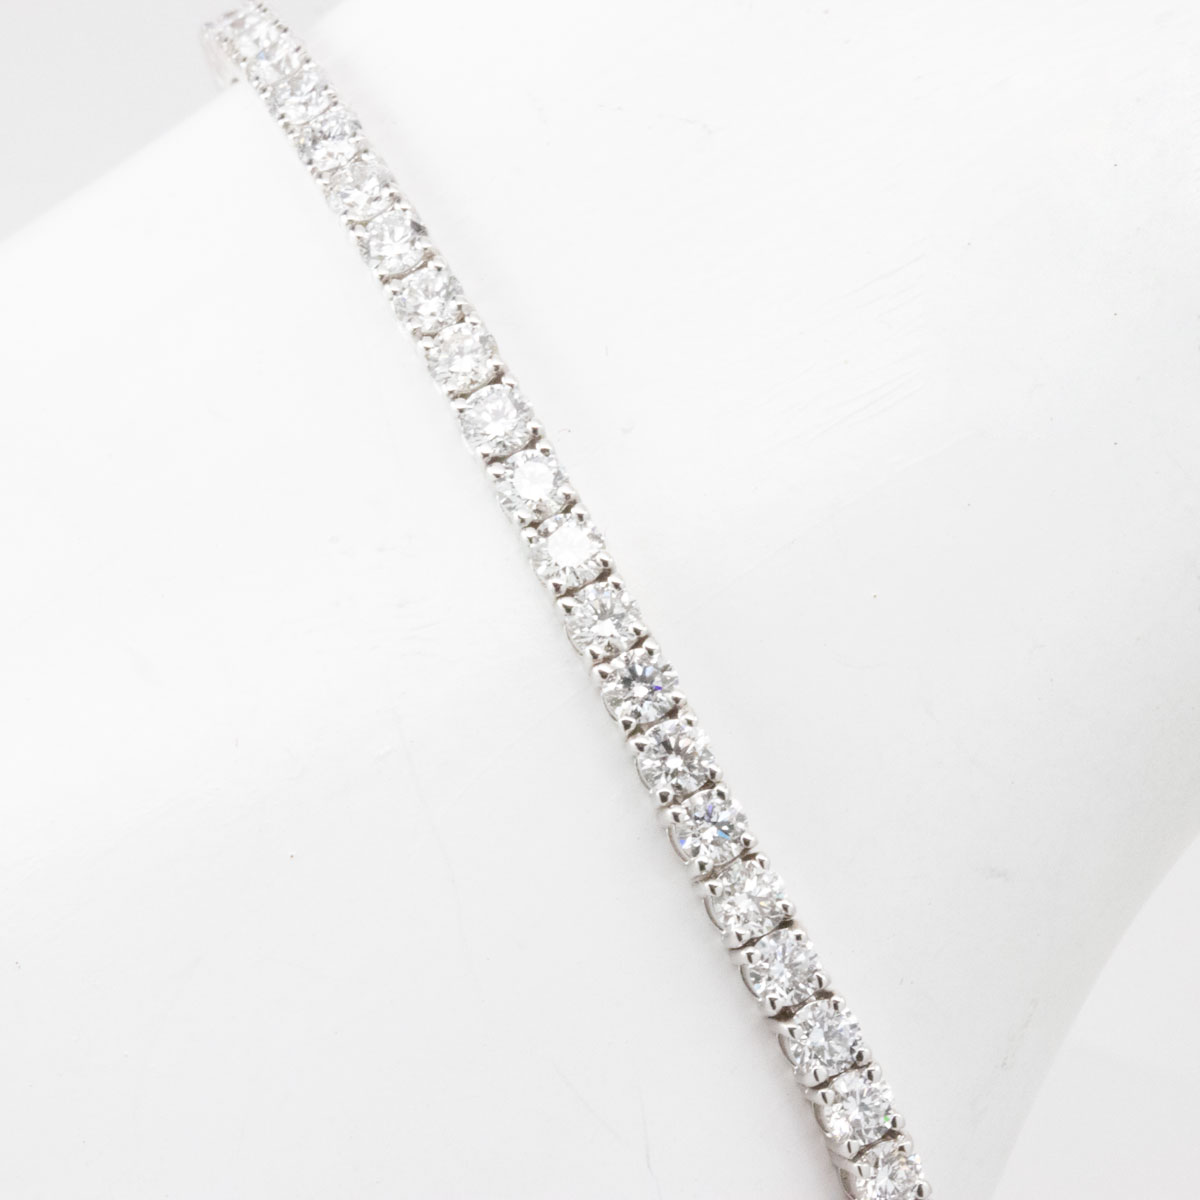 3 Carat Lab-Grown Diamond Tennis Bracelet, 14k White Gold